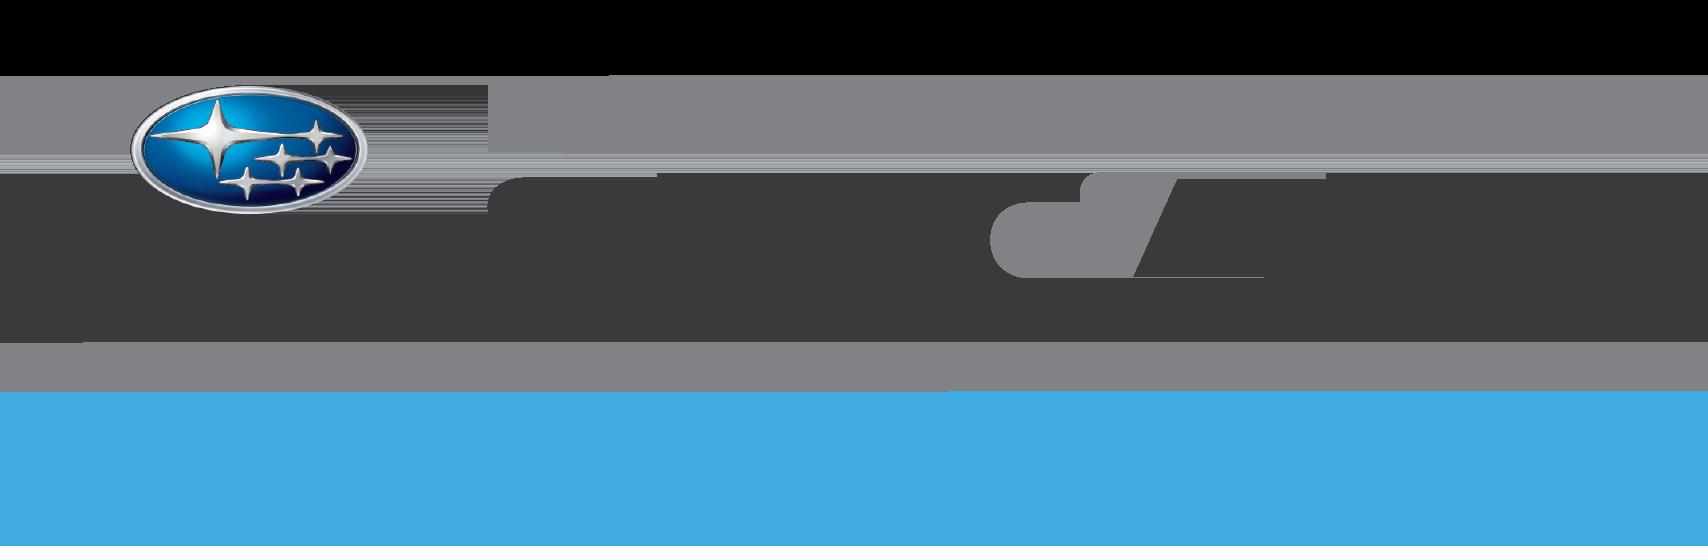 Rairdon's Subaru of Auburn, Auburn, WA